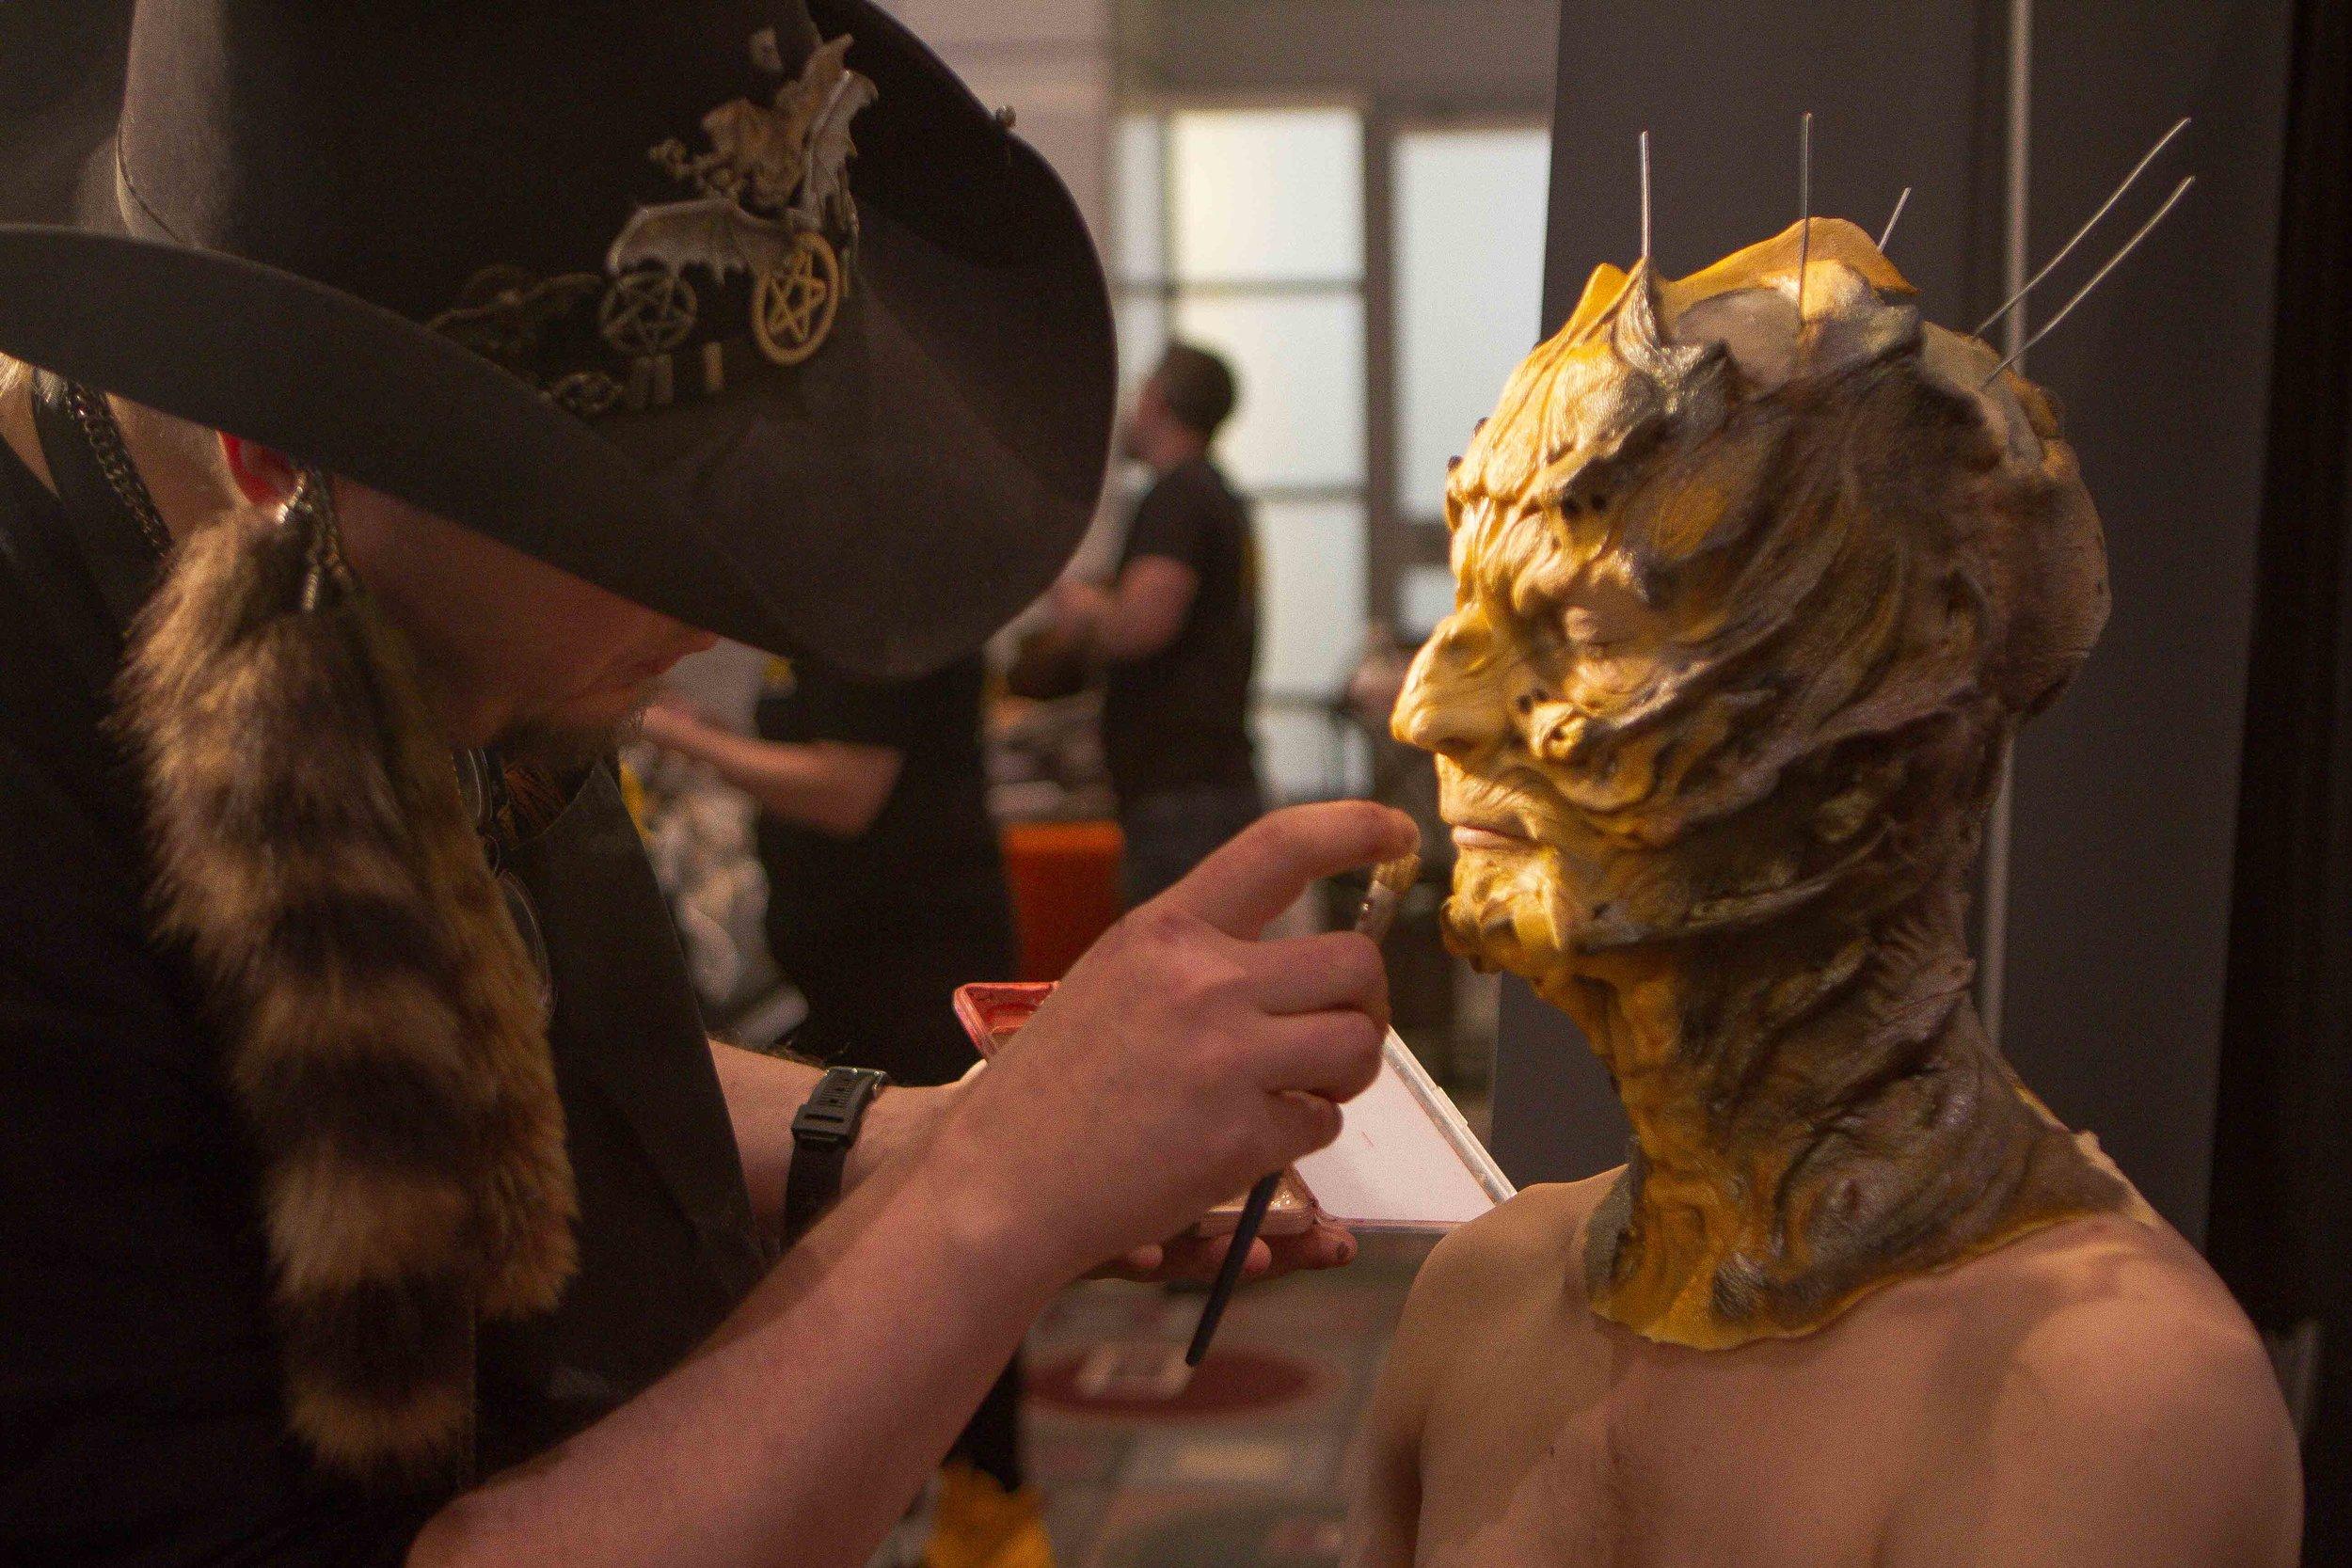 IMATS 2017 - FX Creator Josef Rarach & Vlad Taupesh Fantasy Special Effects Makeup (www.creativecastlestudios.com:fx-creator - www.KyleReaArt.com - www.KyleReaPhotography.com) 17.jpg